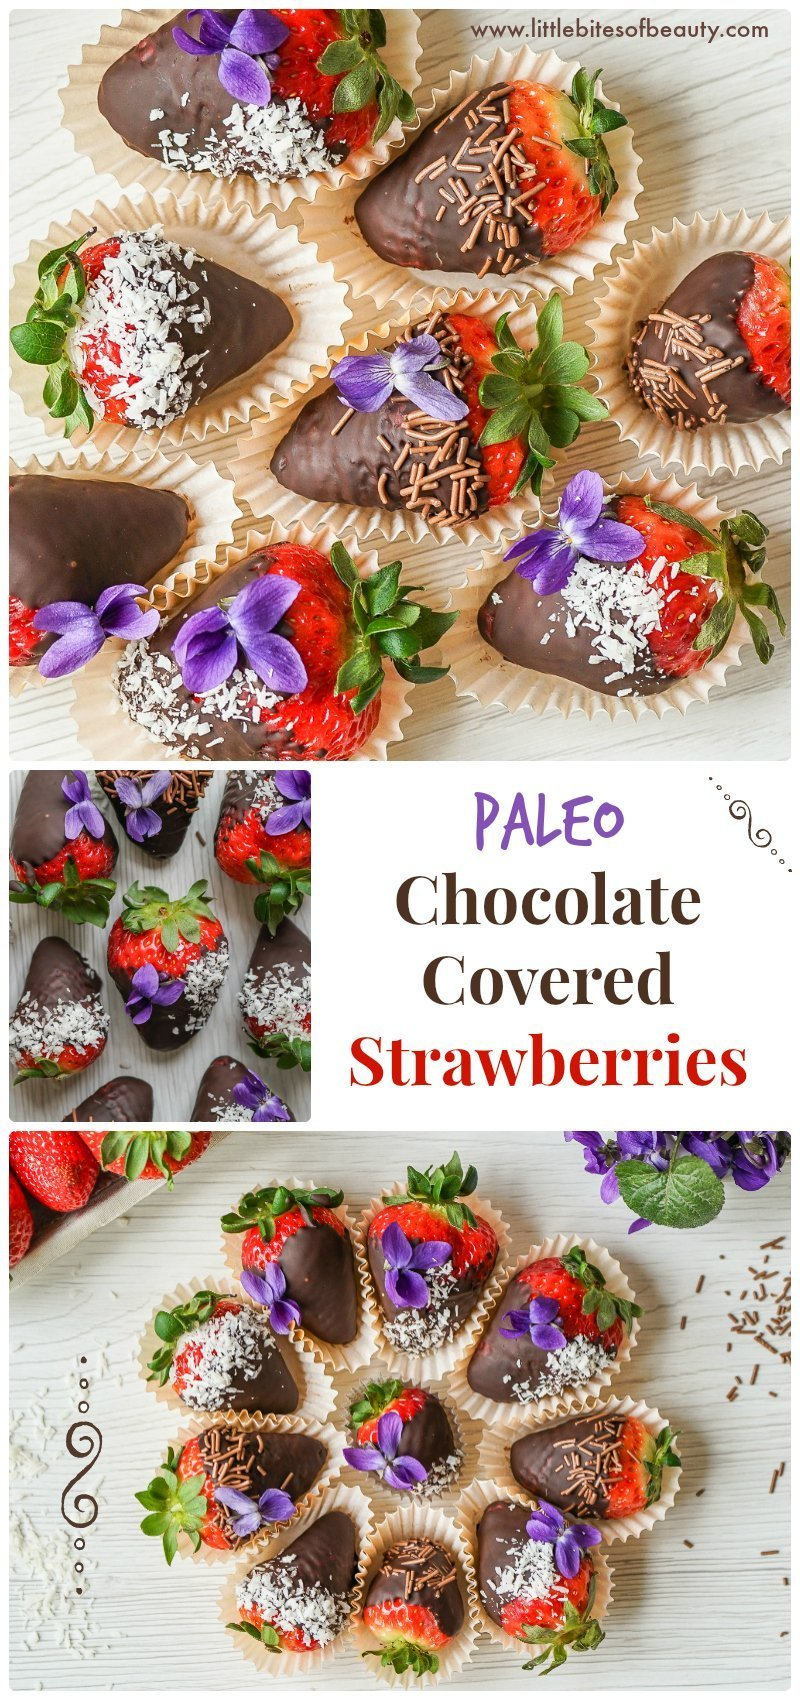 Easy Paleo Chocolate Covered Strawberries (GF & DF)